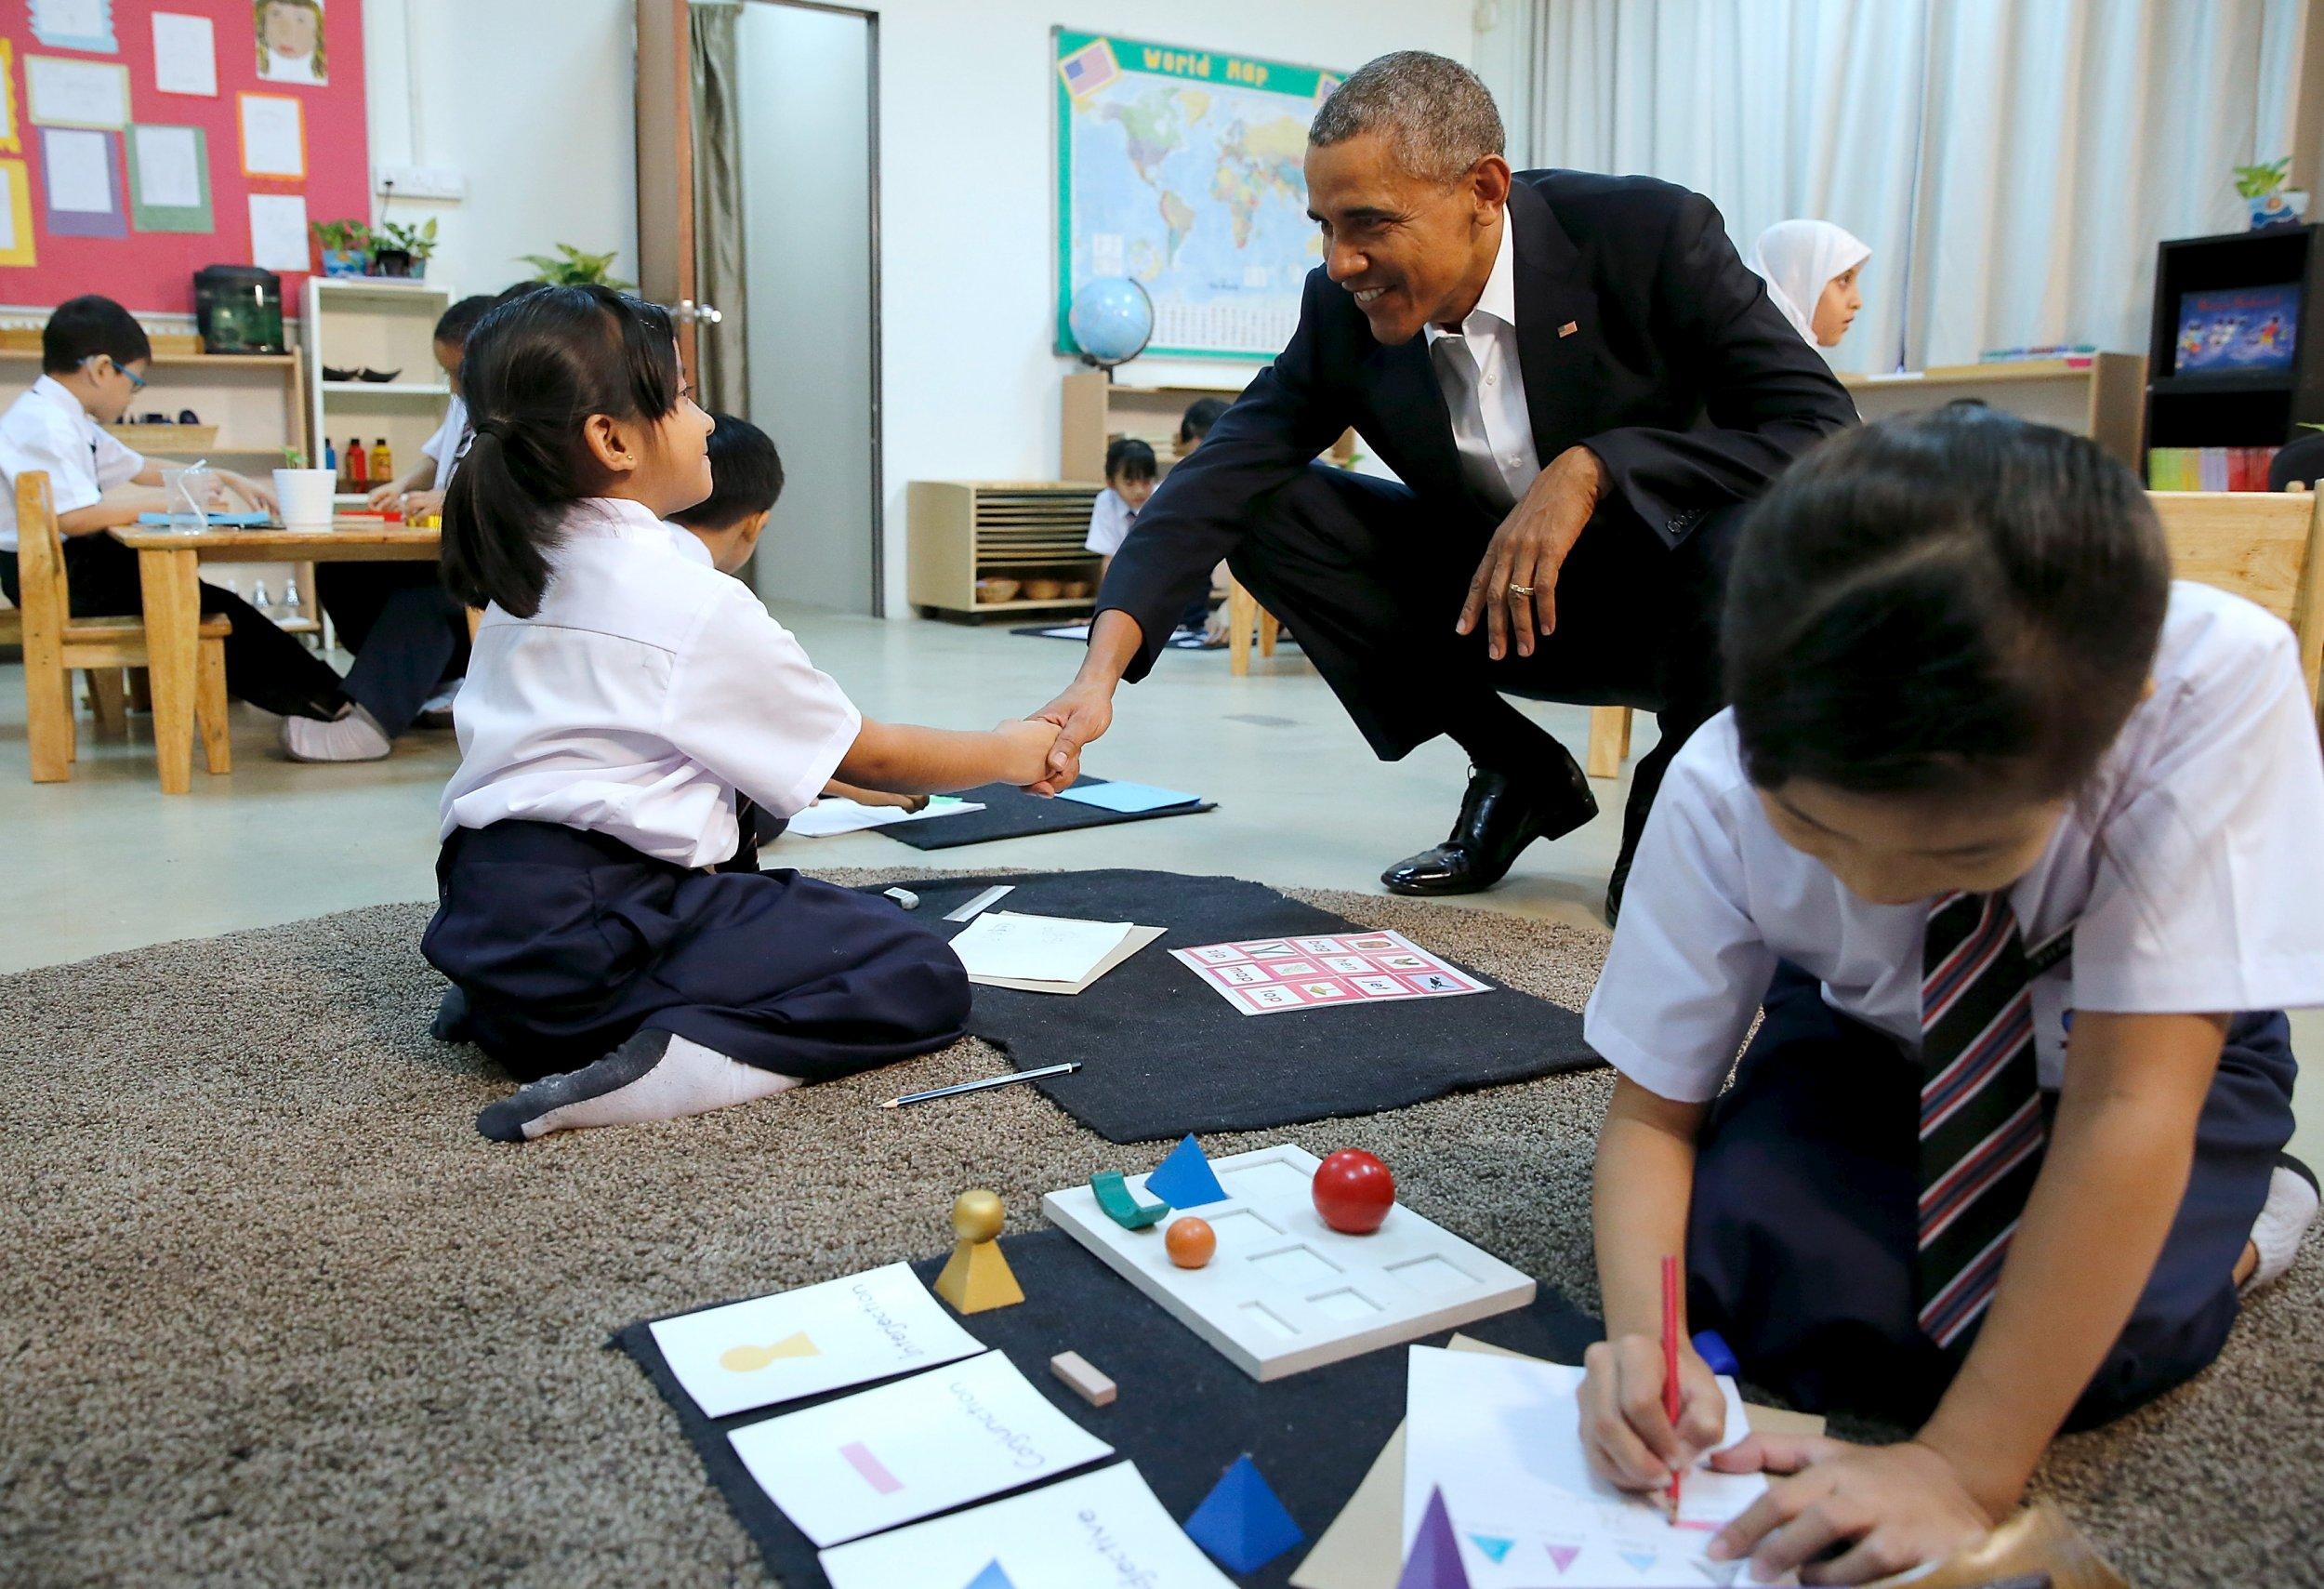 1127_Obama Refugees